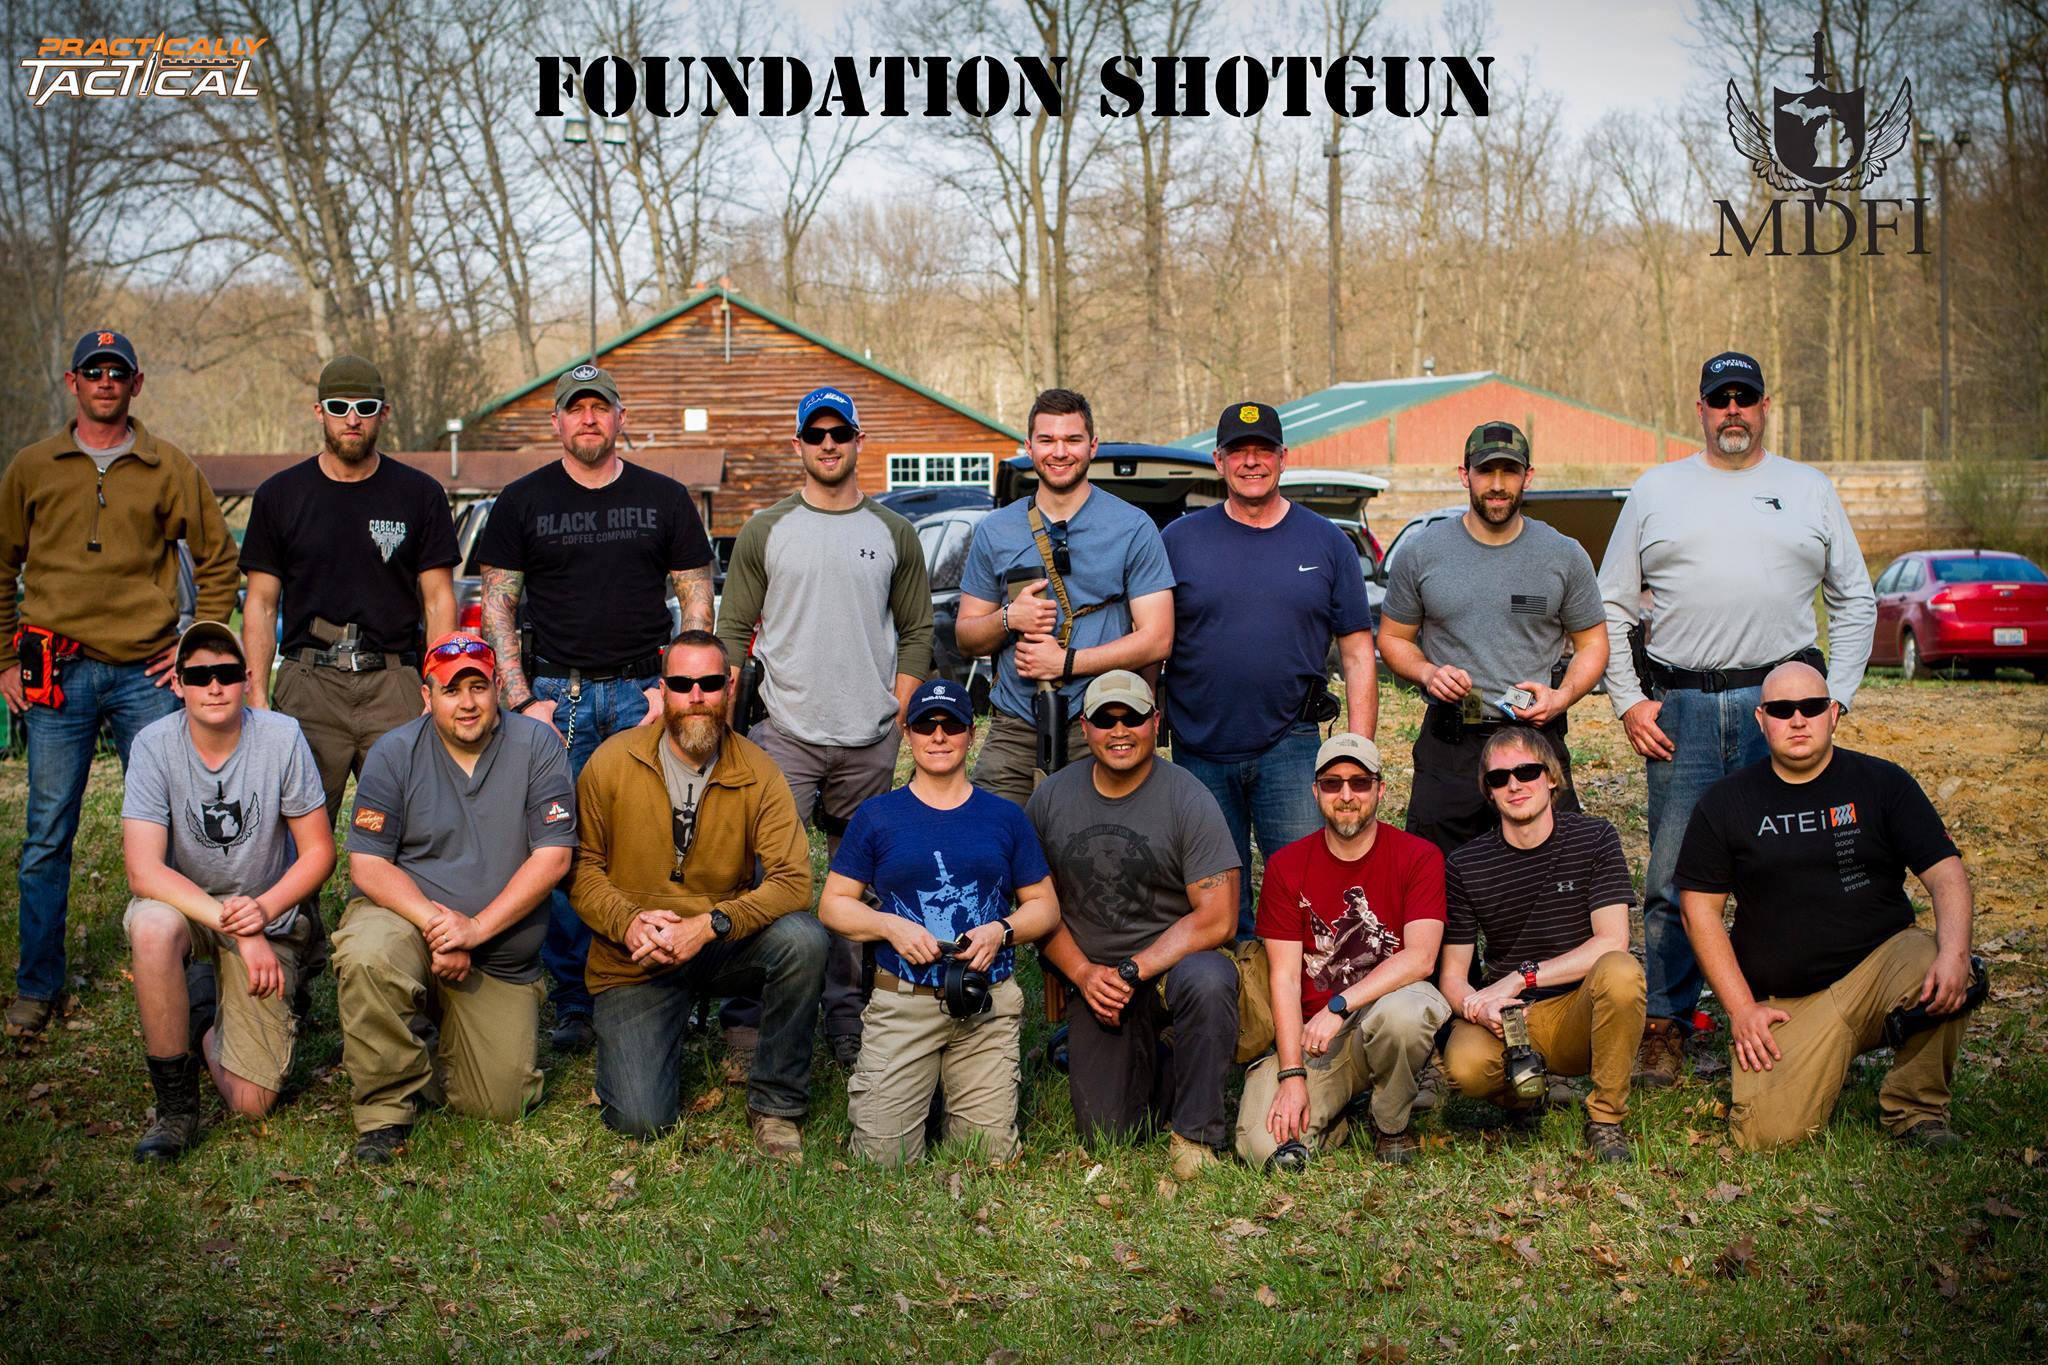 MDFI Foundation Shotgun